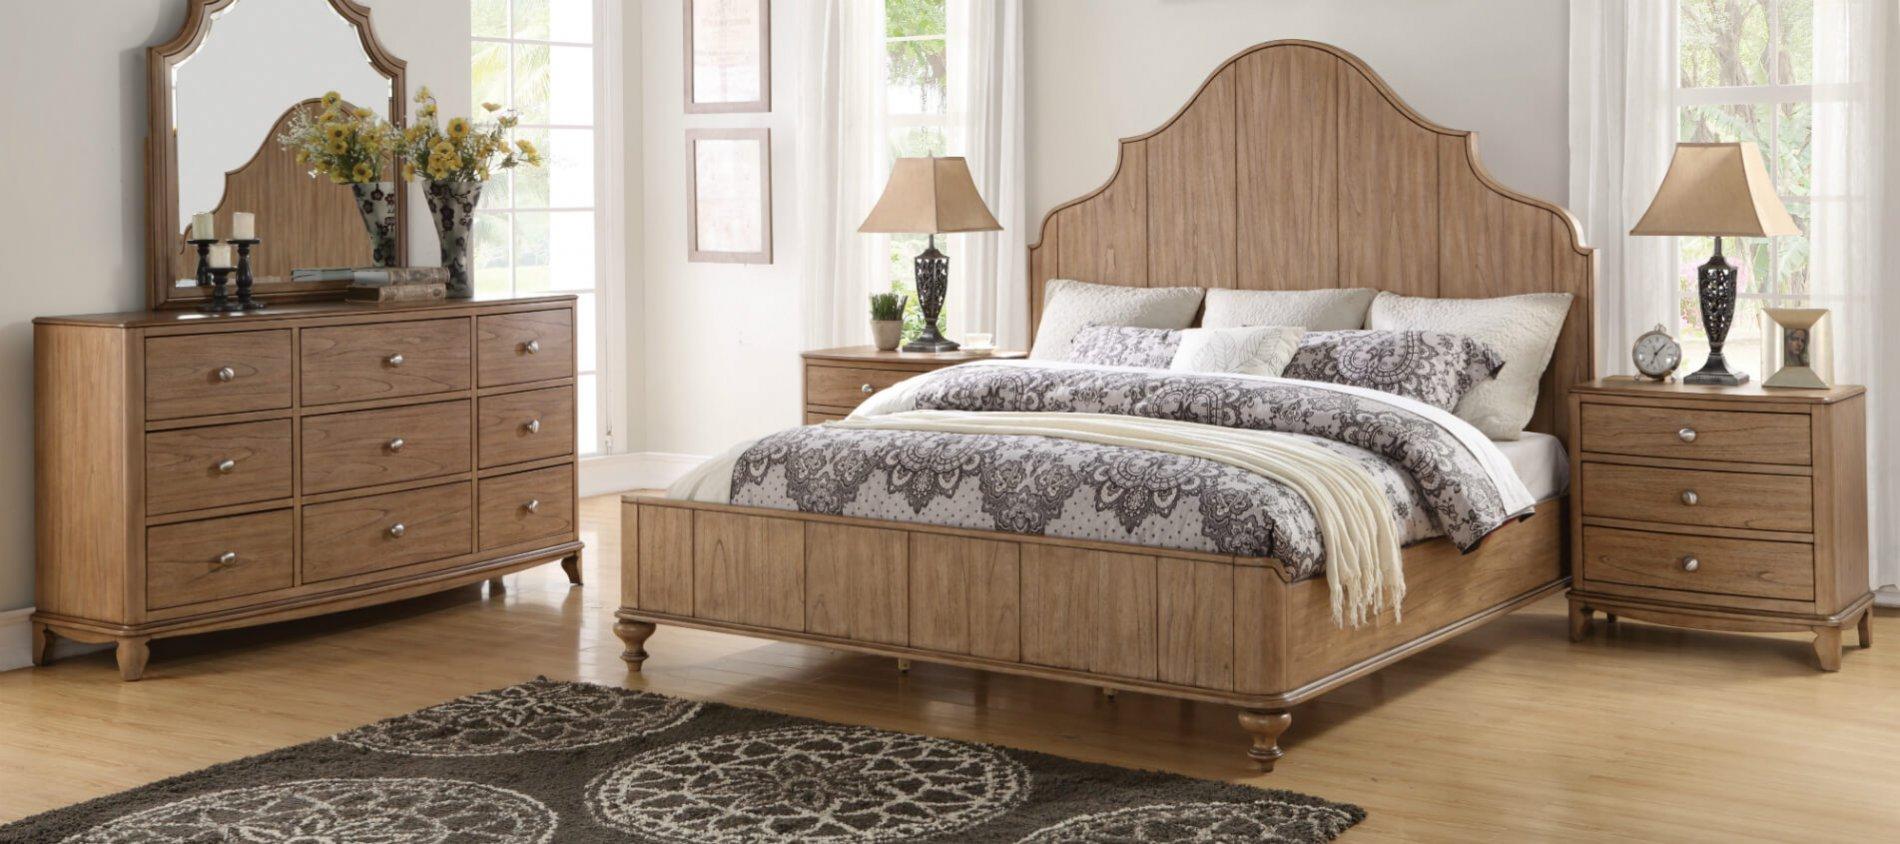 Miramar Collection Bedroom set